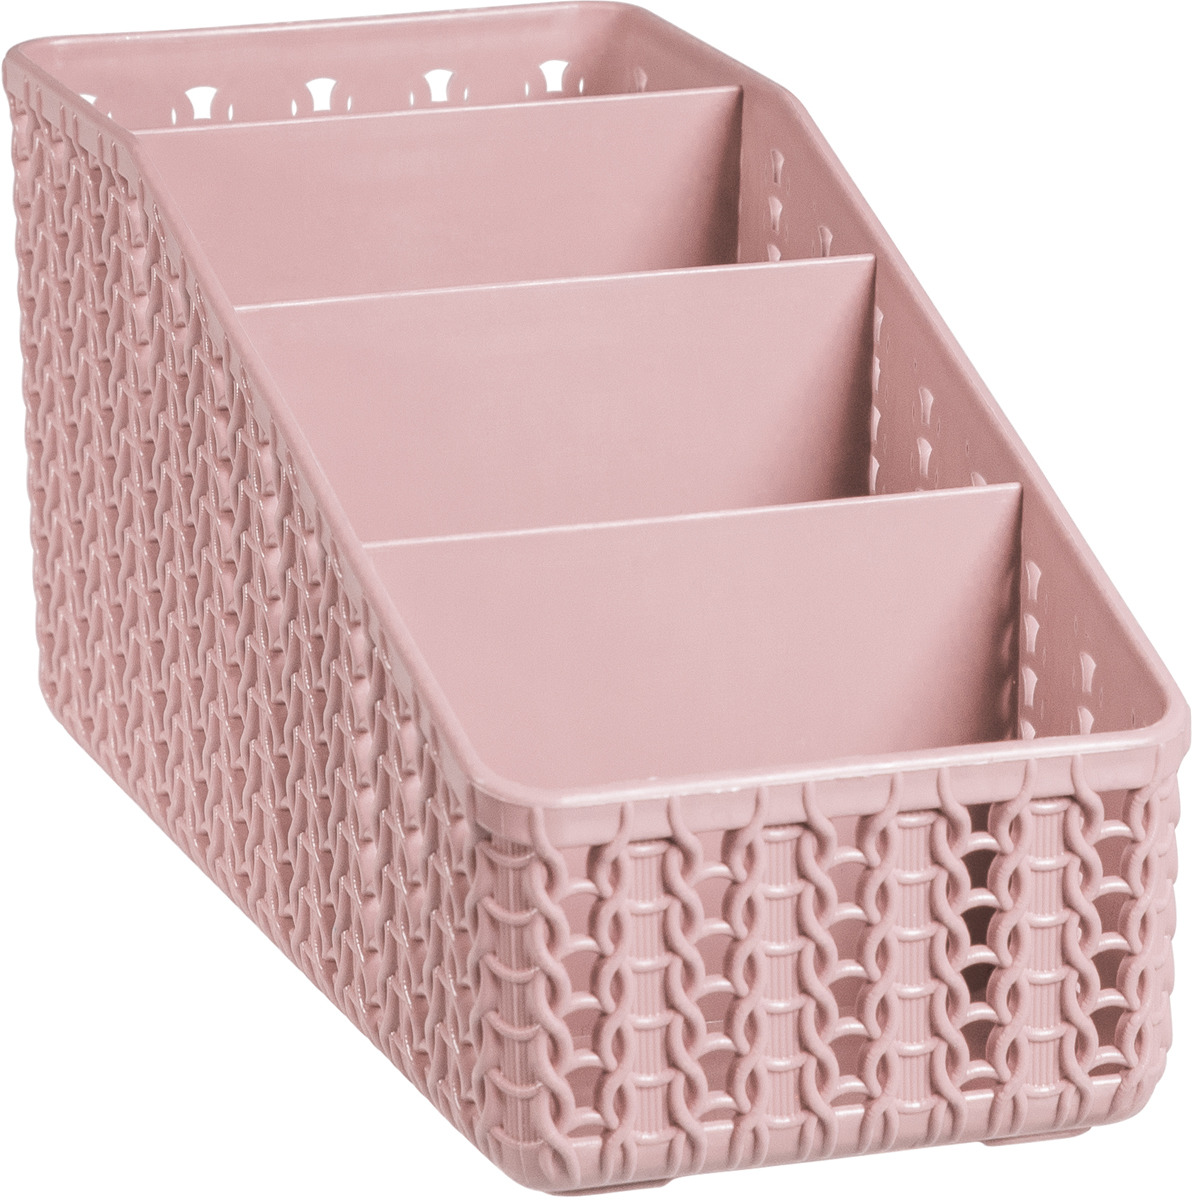 Органайзер Idea Вязание, 4 секции, М 2382, 20 х 9,5 х 10 см, чайная роза органайзер для специй idea цвет белый 6 х 16 х 16 см